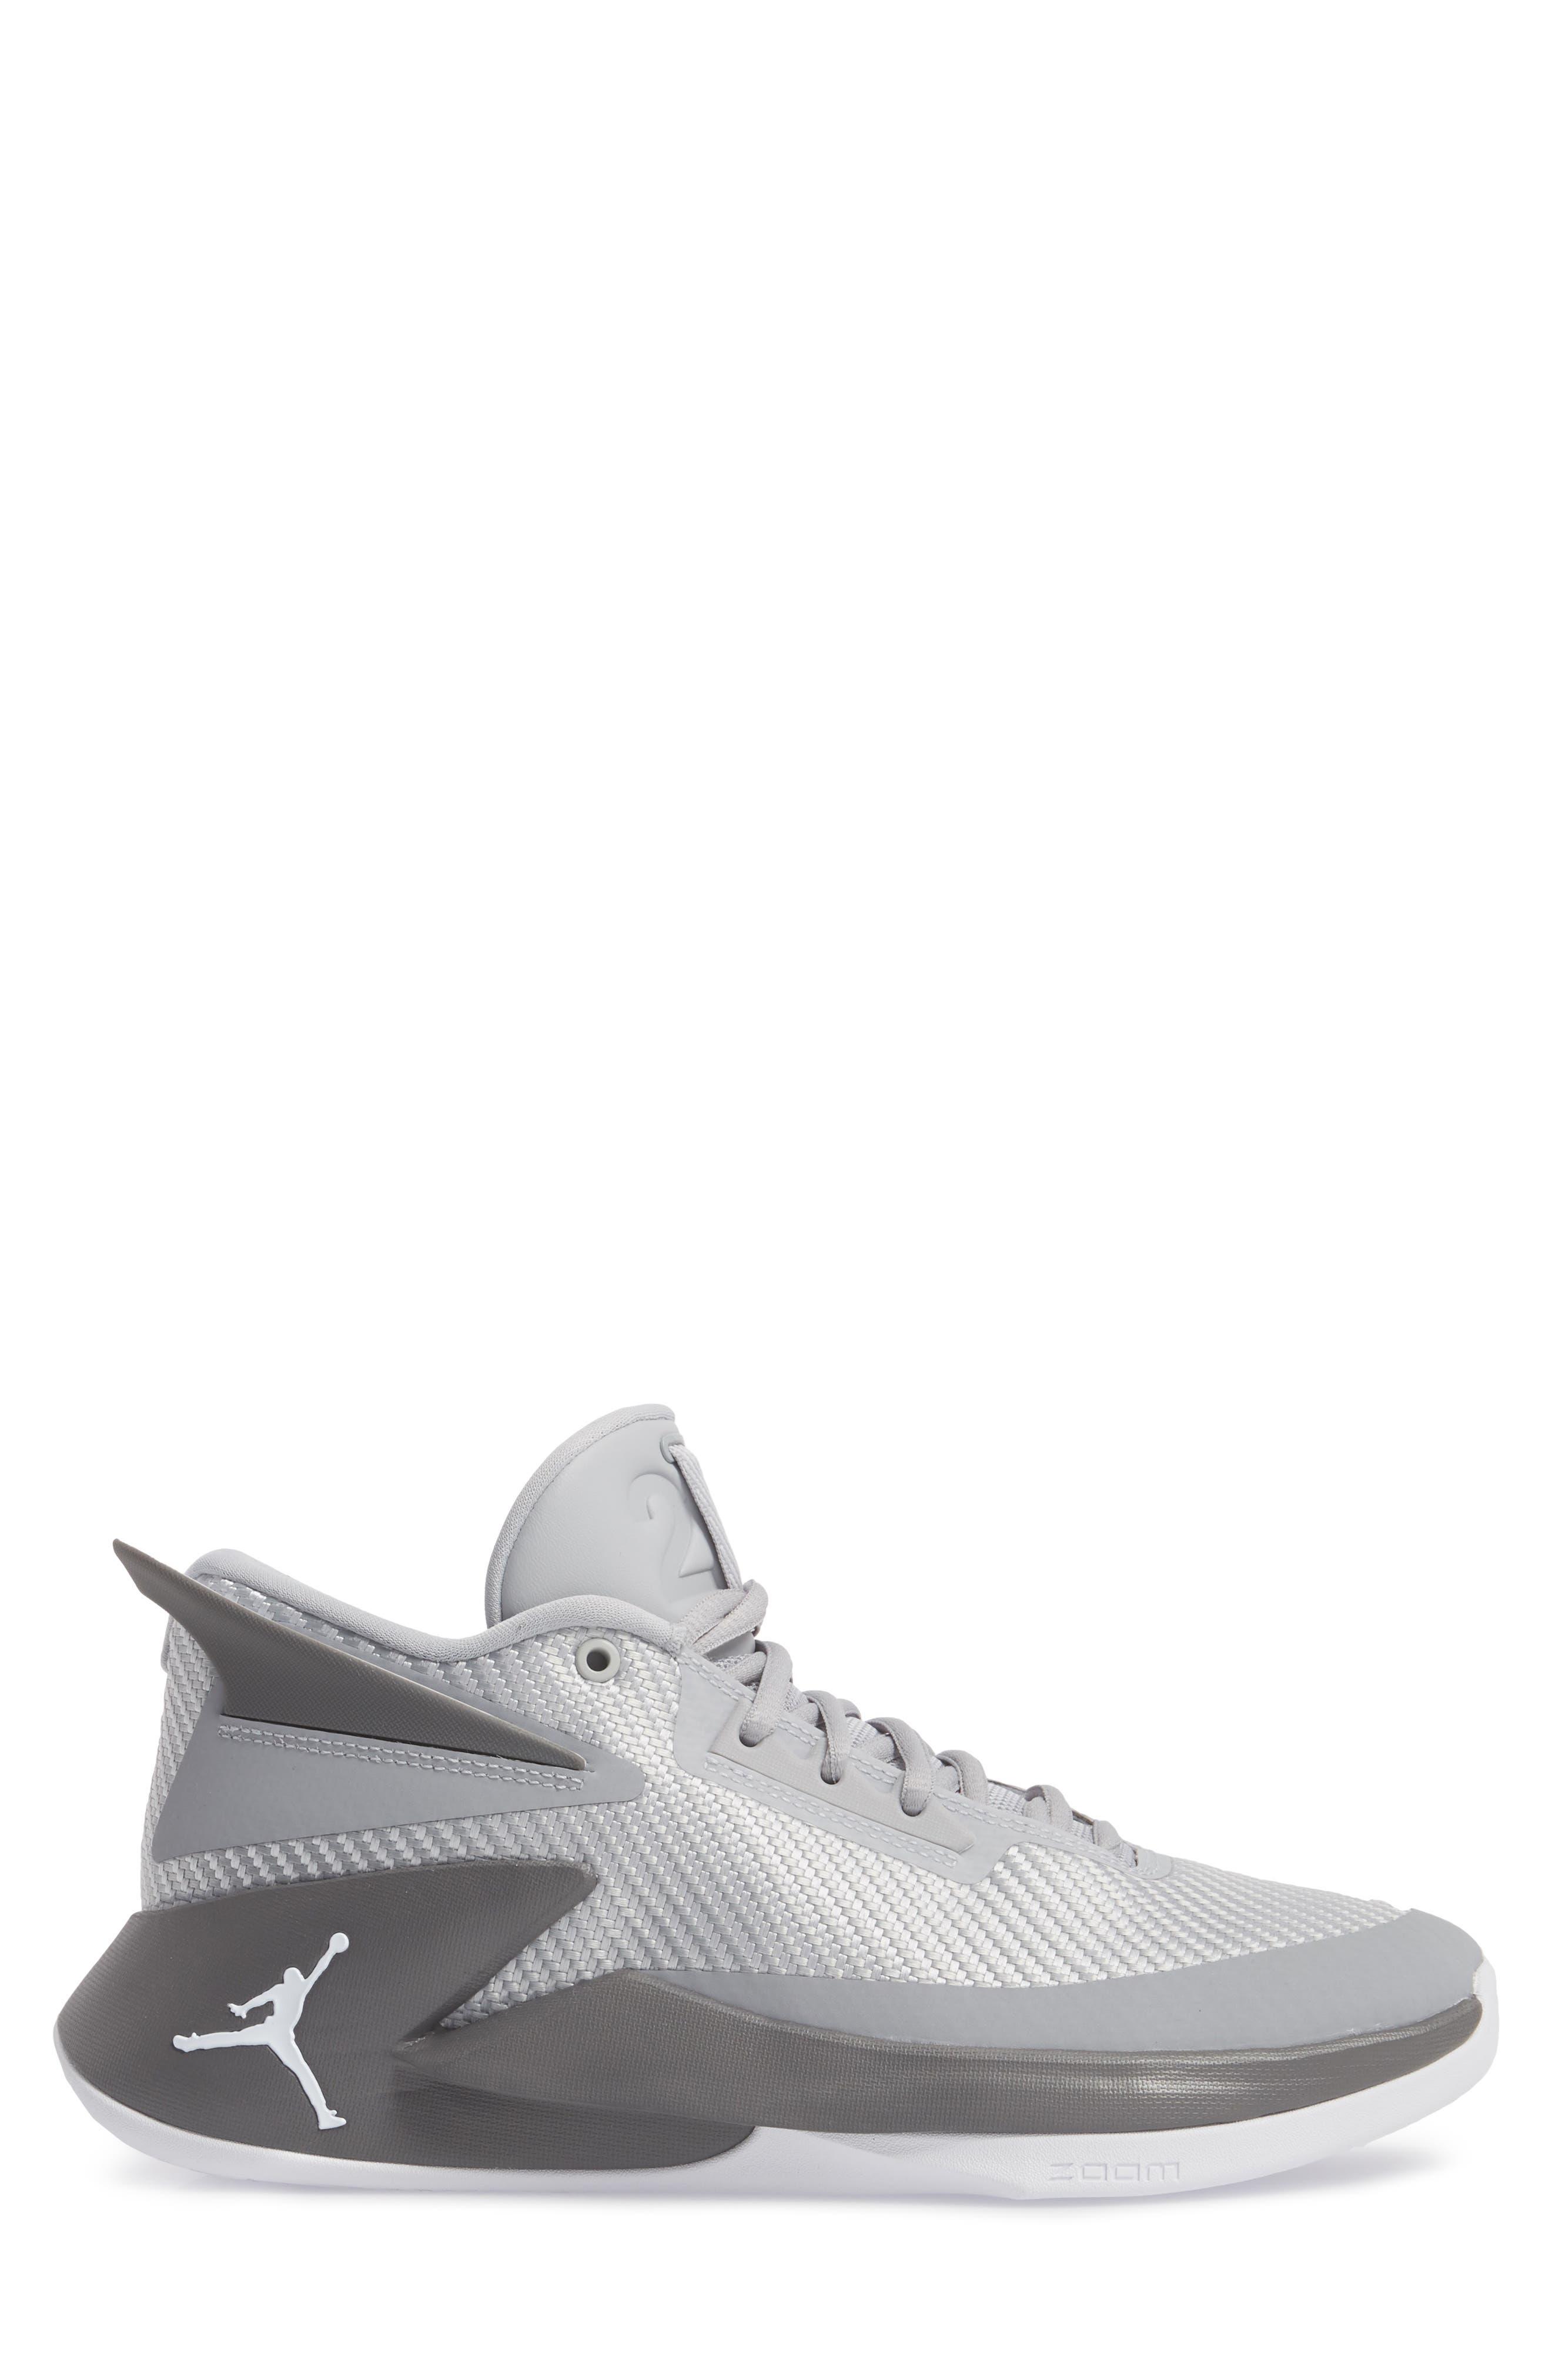 Jordan Fly Lockdown Sneaker,                             Alternate thumbnail 3, color,                             Wolf Grey/ White/ Dark Grey